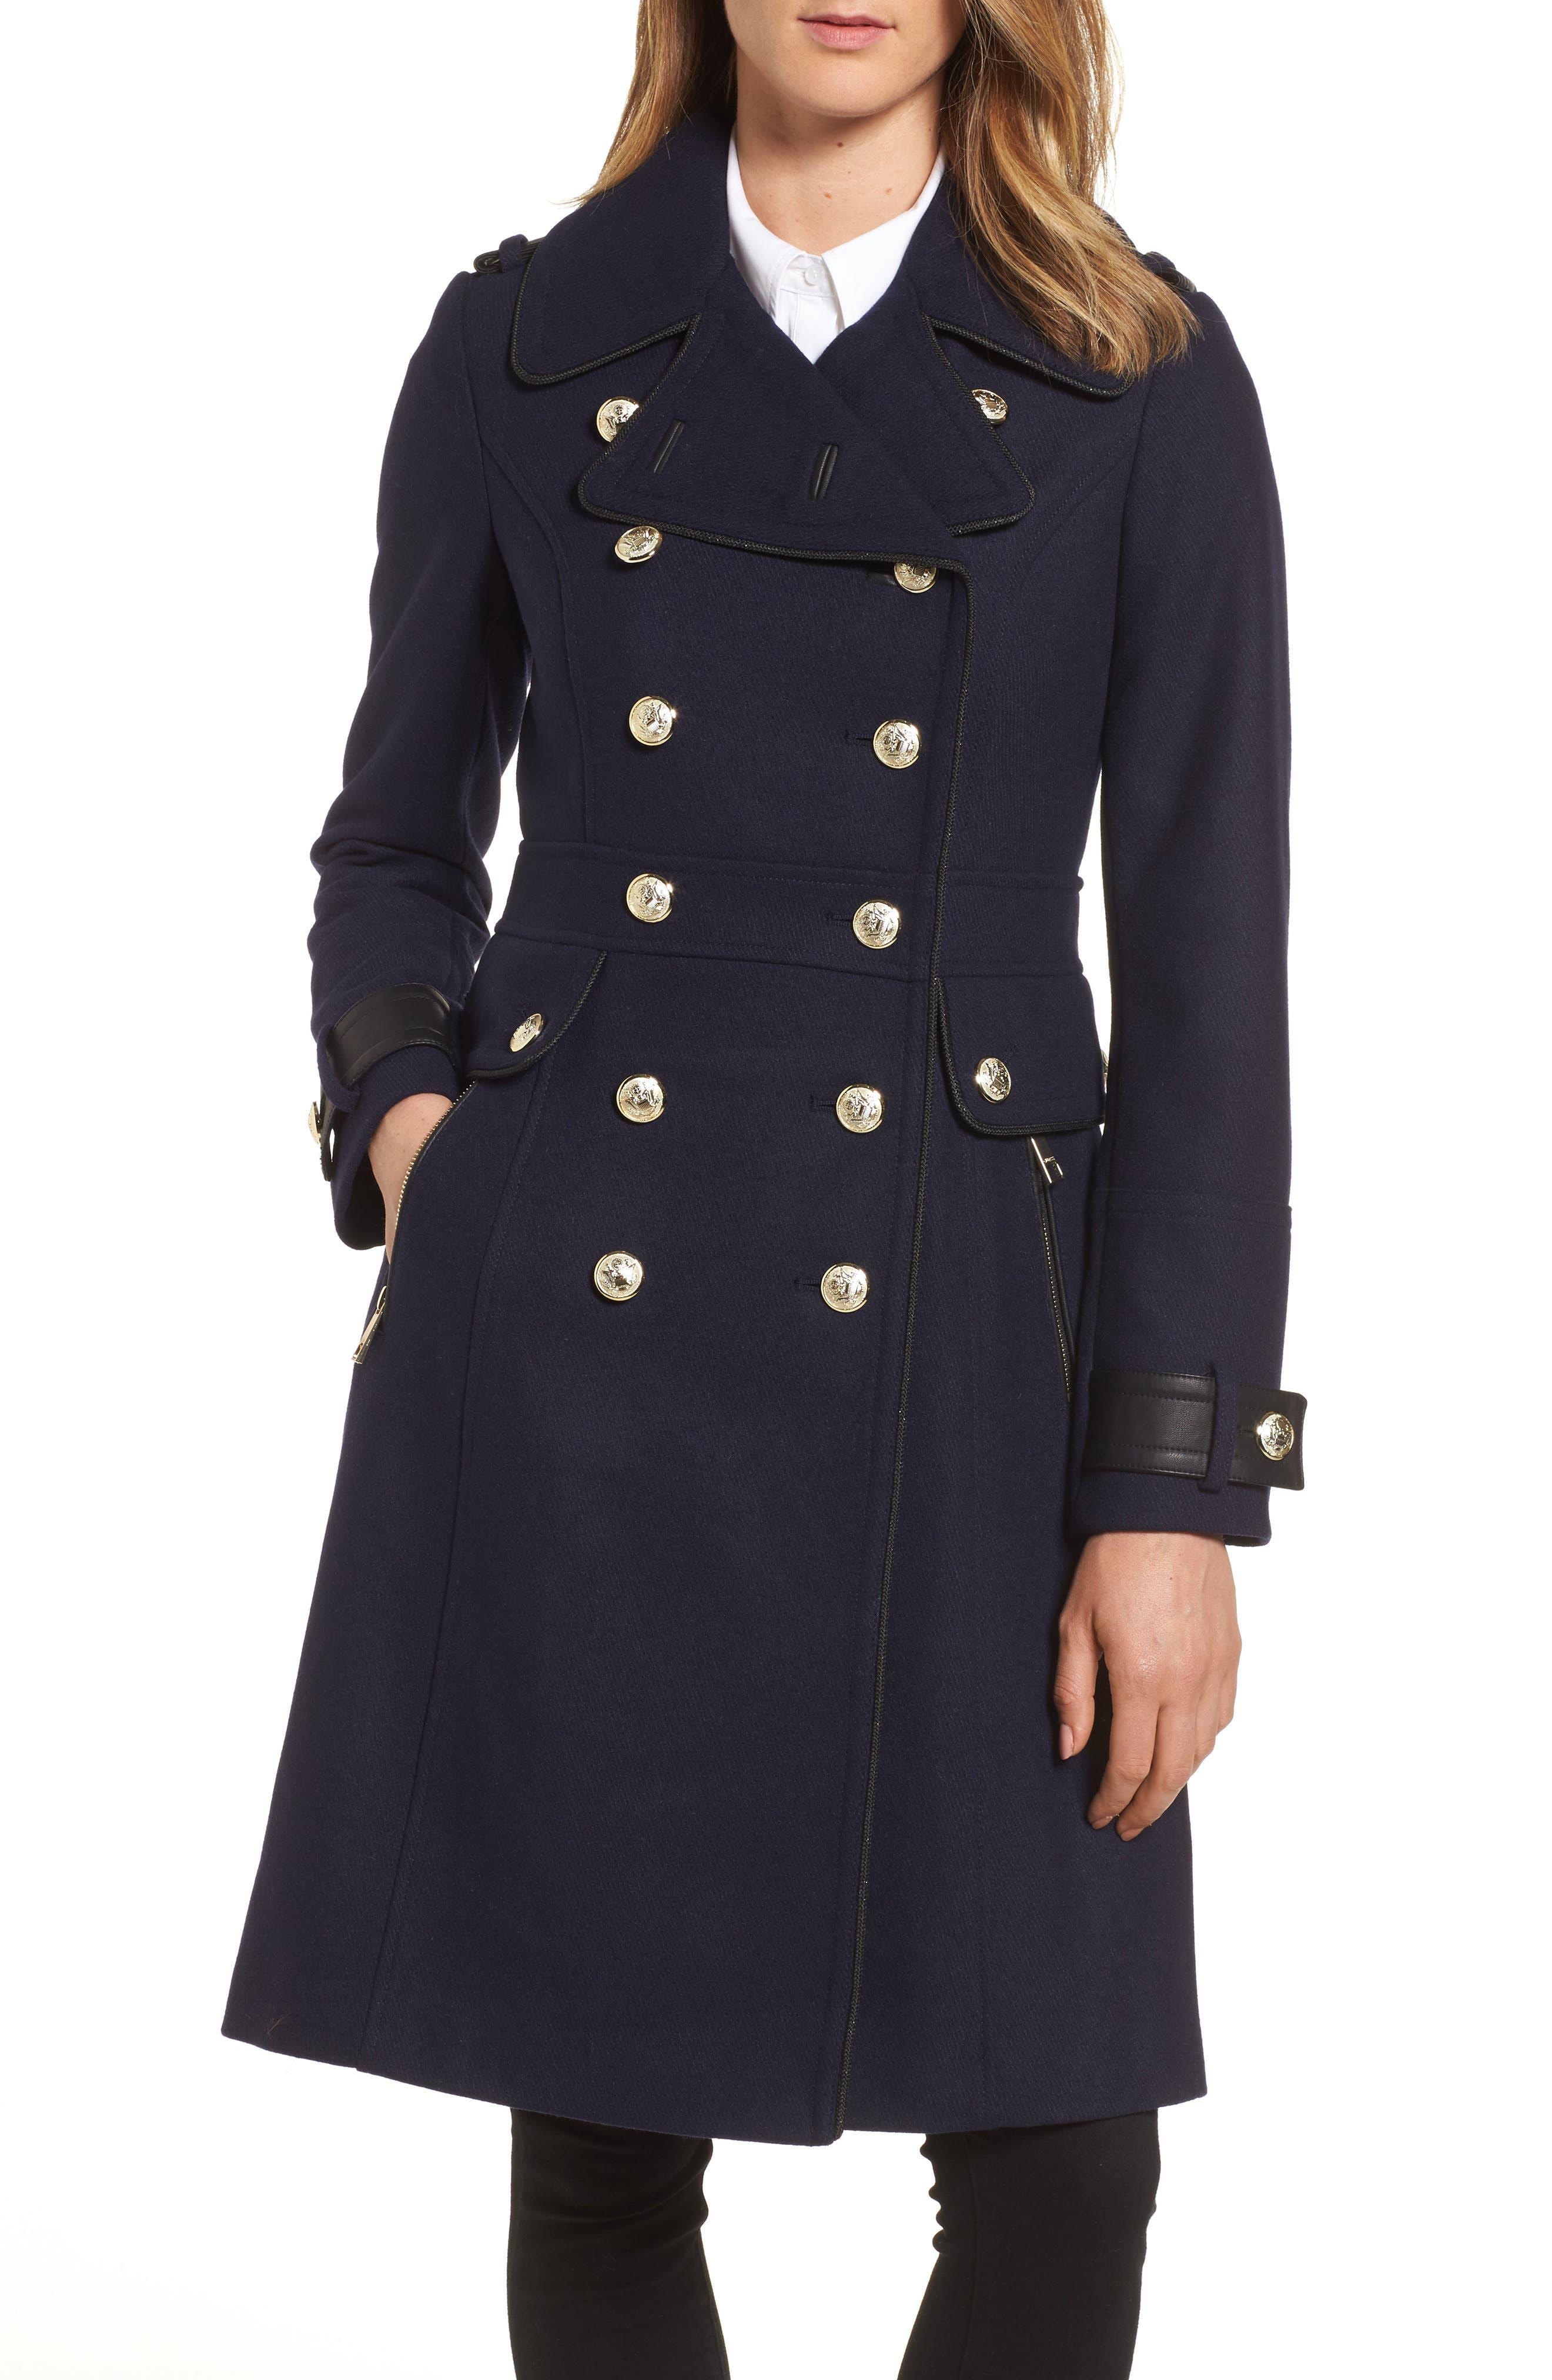 GUESS Wool Blend Military Coat